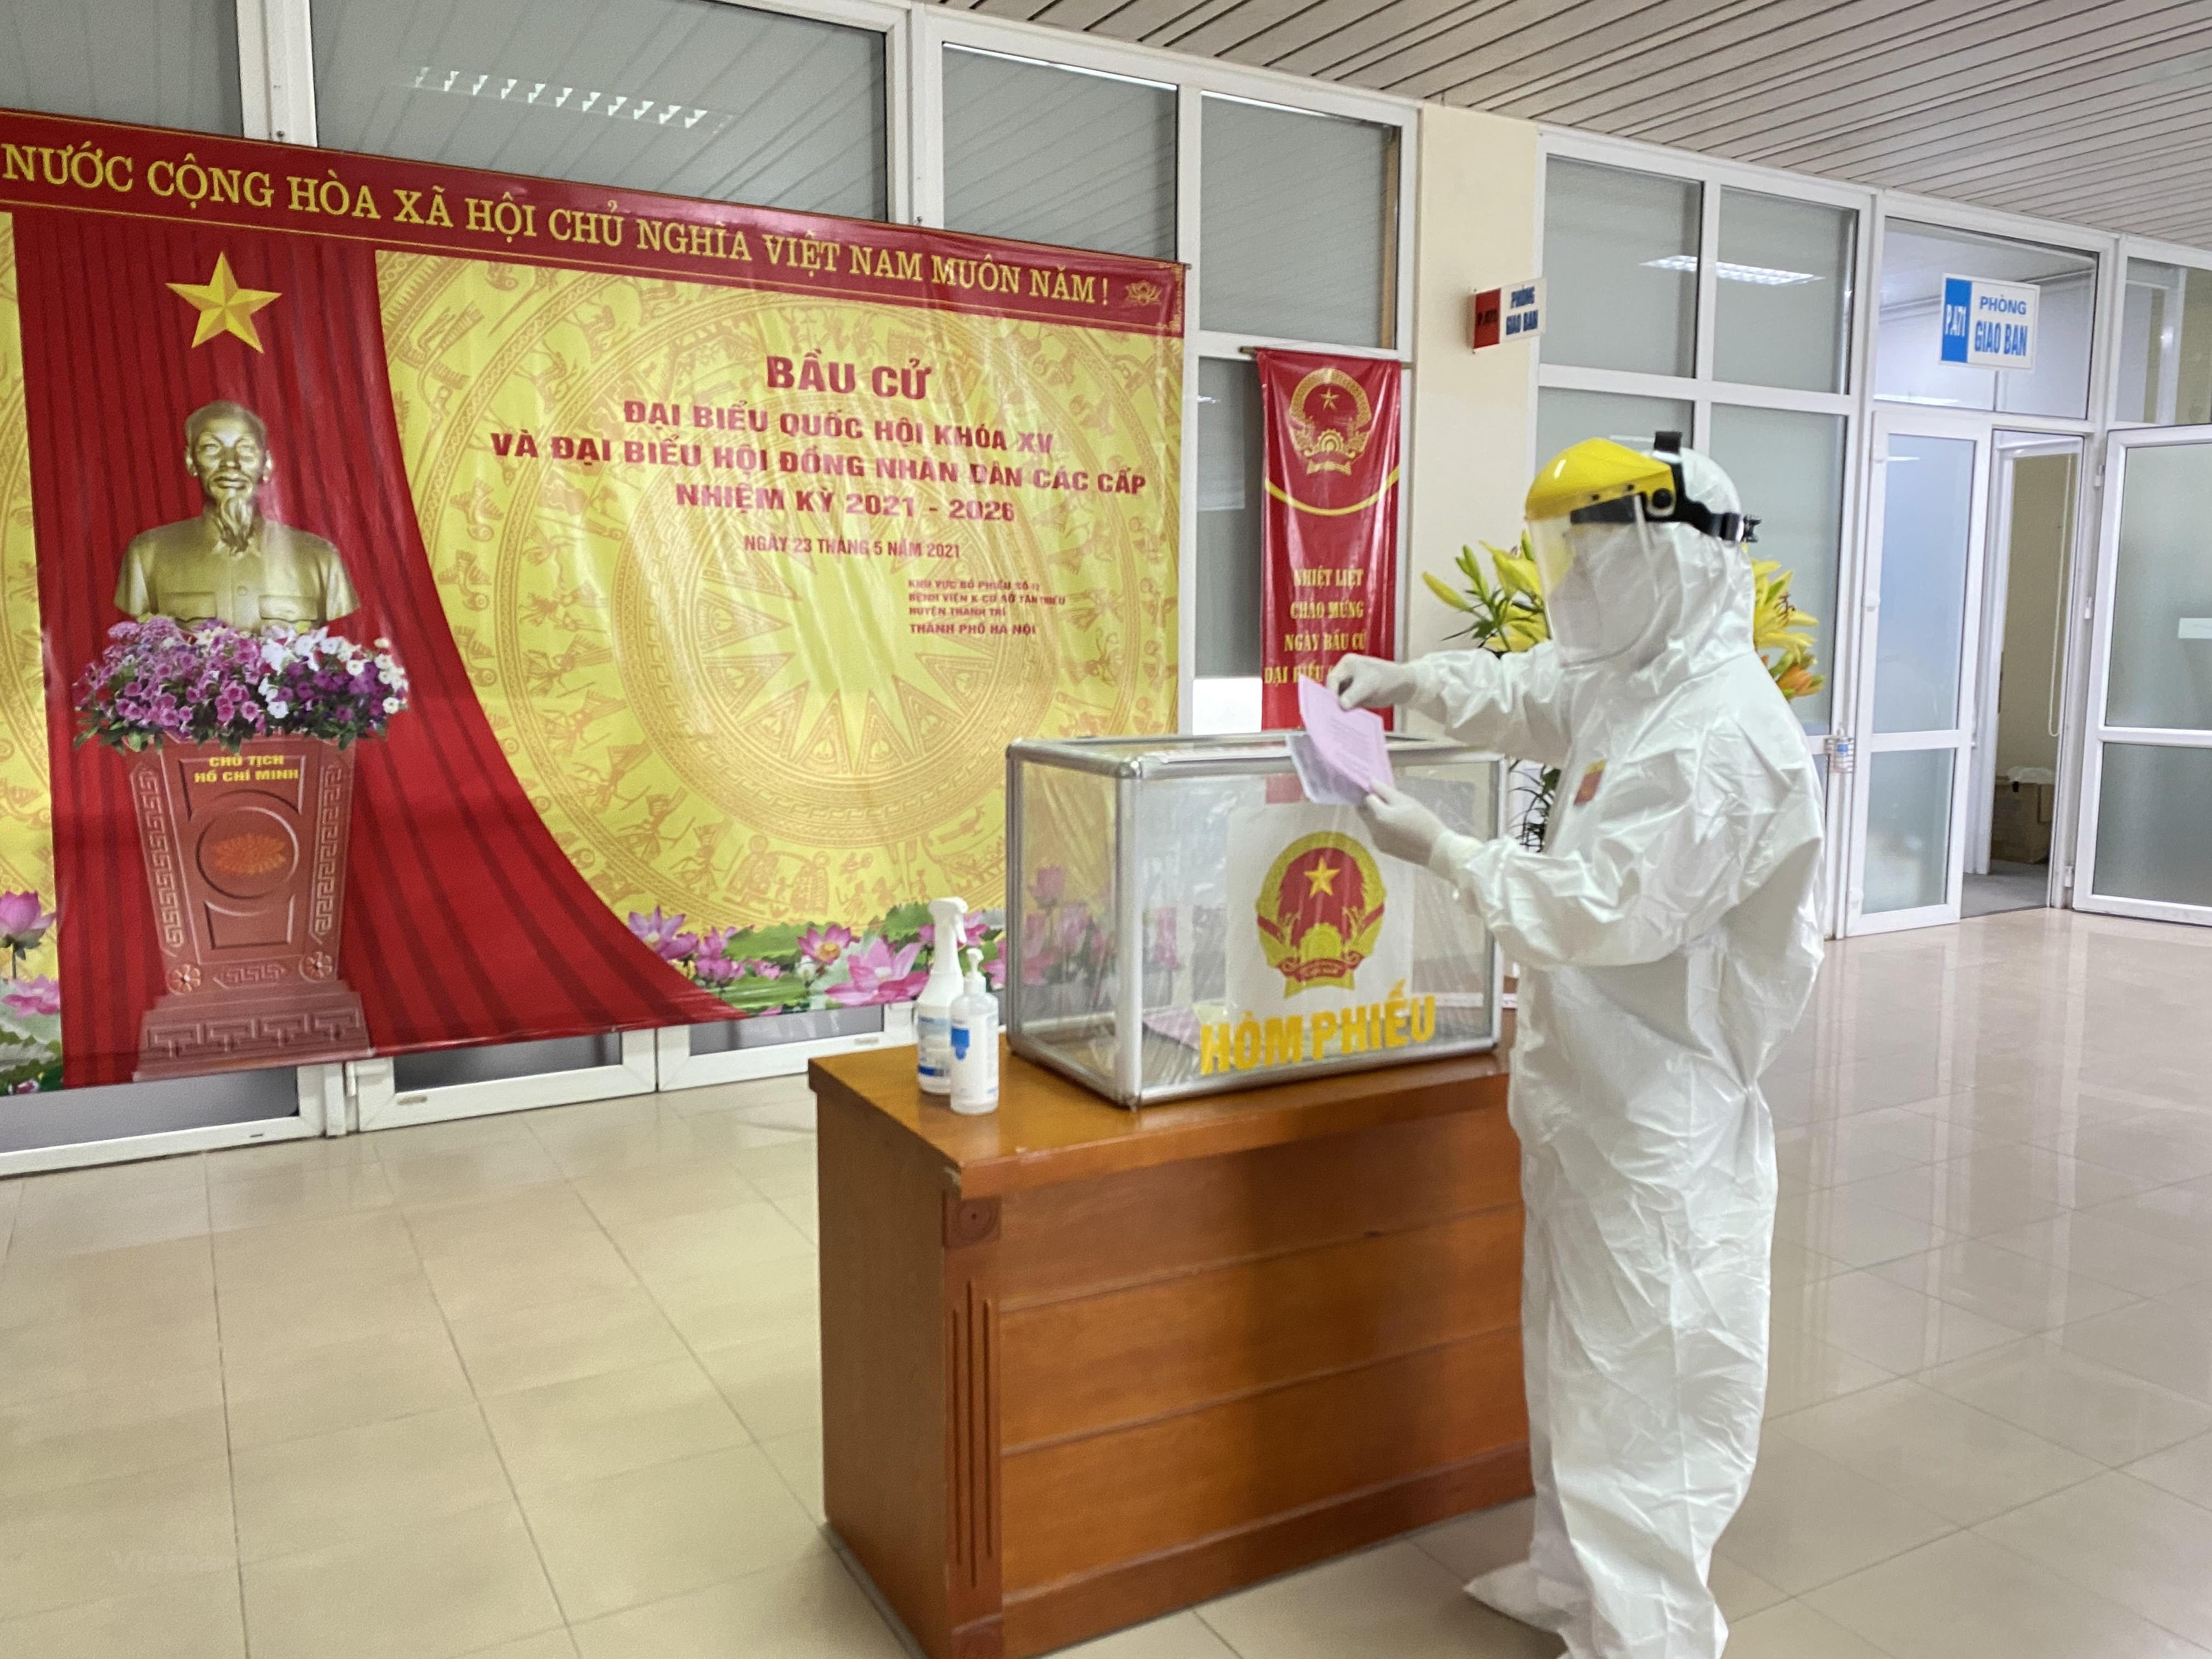 [Photo] Hinh anh Benh vien K Ha Noi to chuc bau cu trong tam dich hinh anh 5